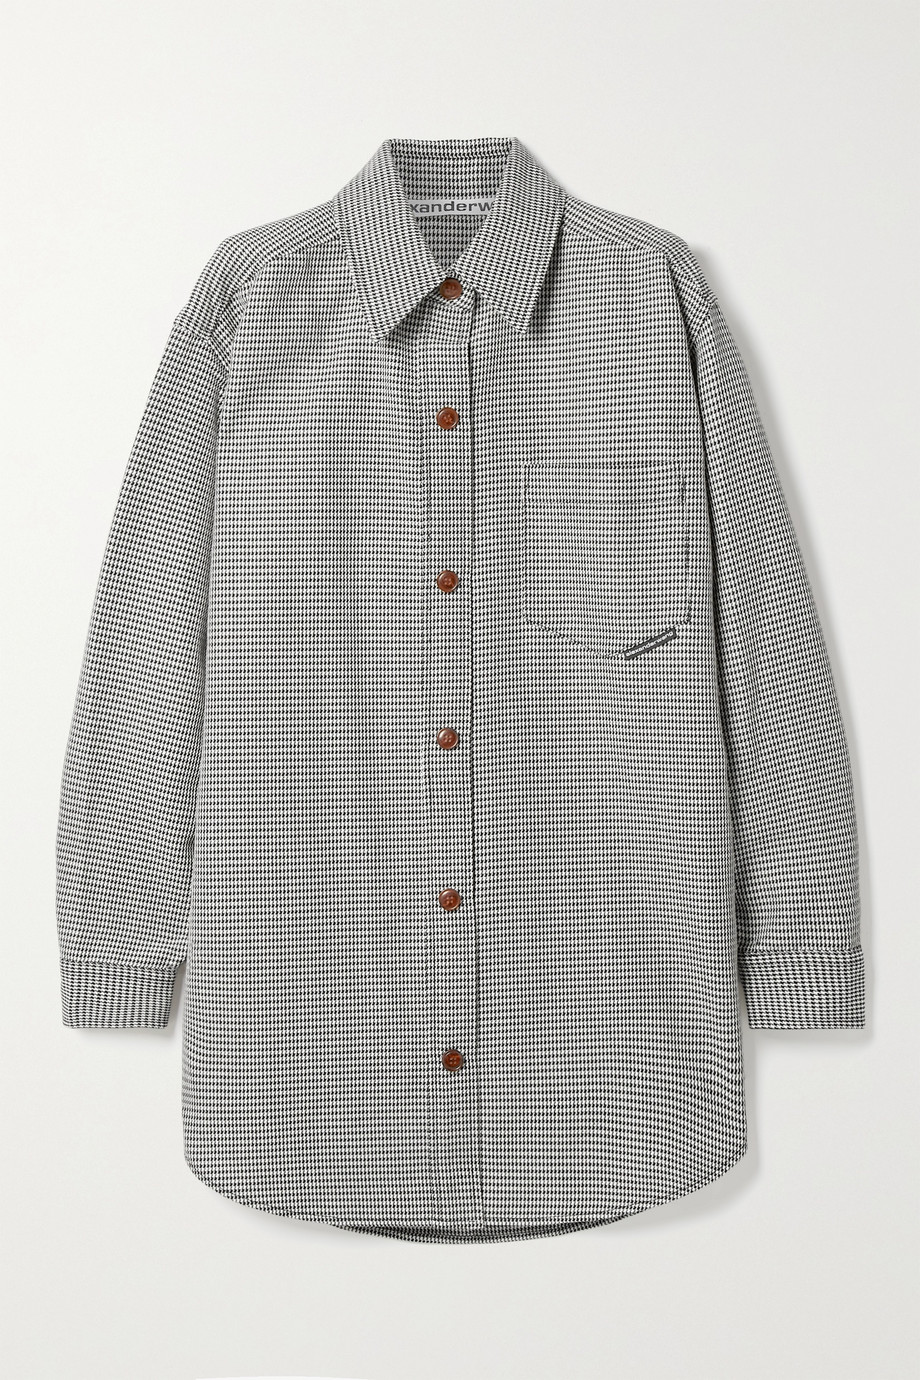 Alexander Wang Oversized houndstooth wool-blend jacket